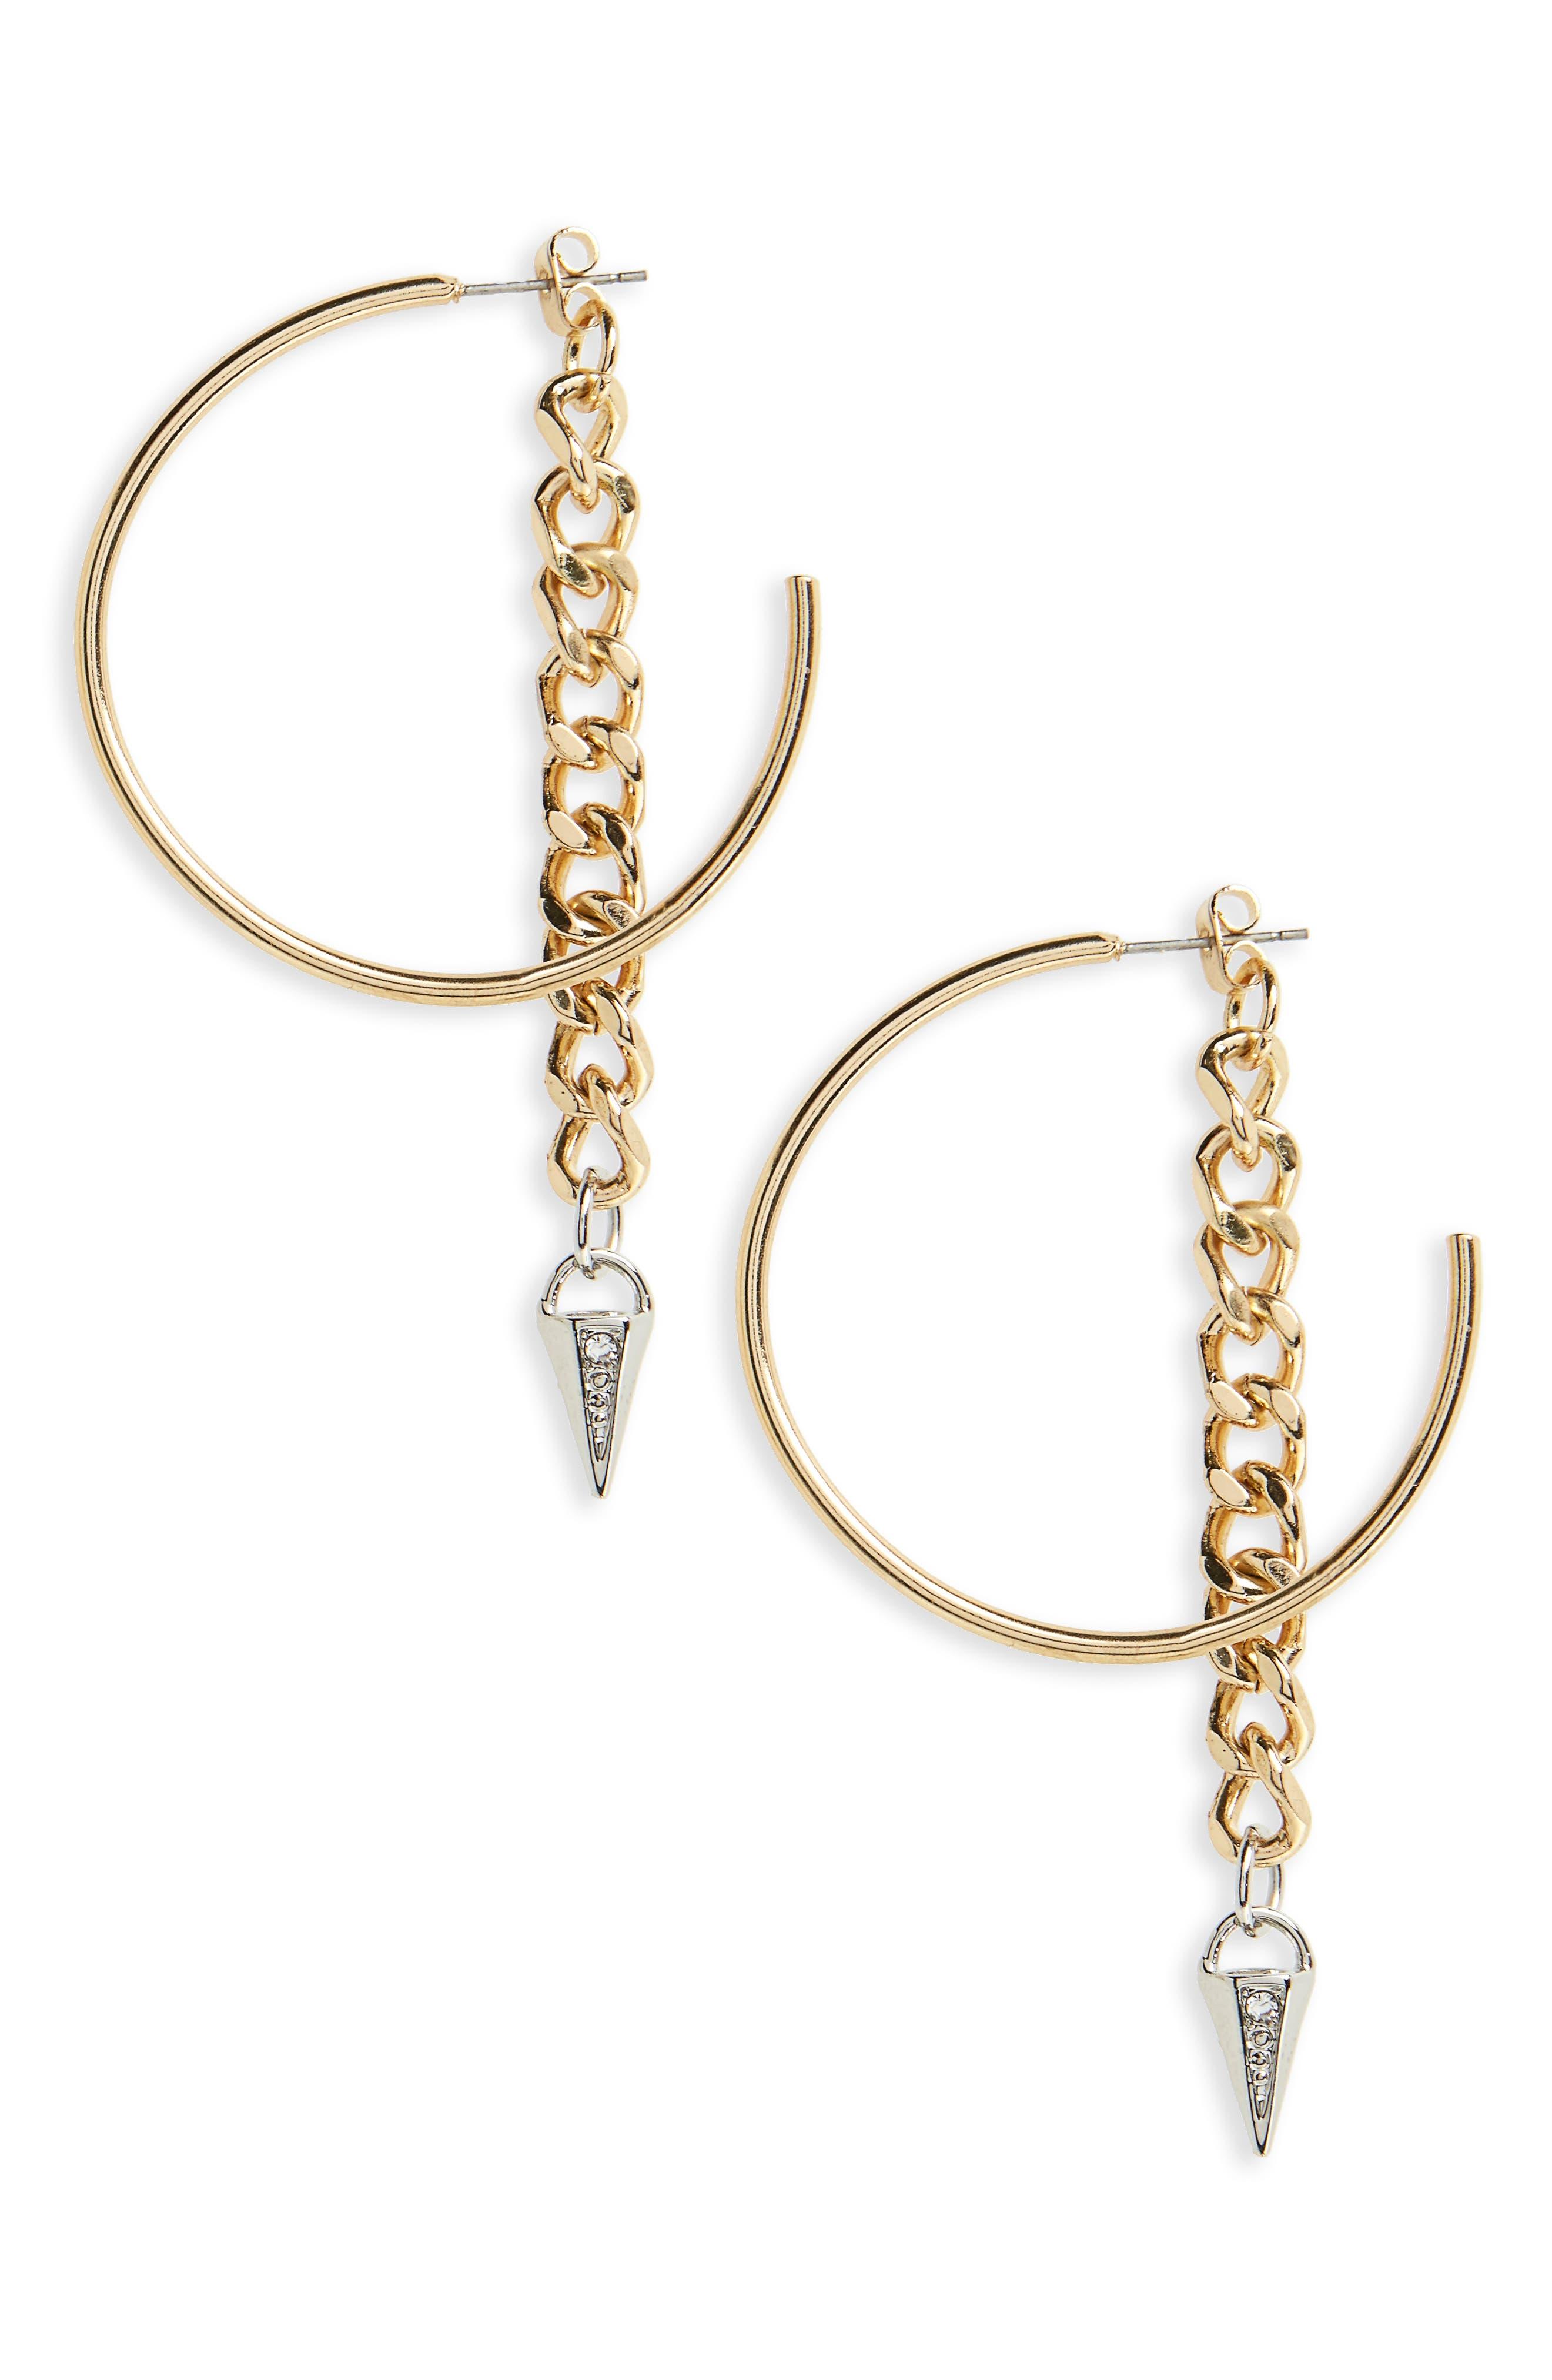 Cara Hoop with Chain & Spear Drop Earrings